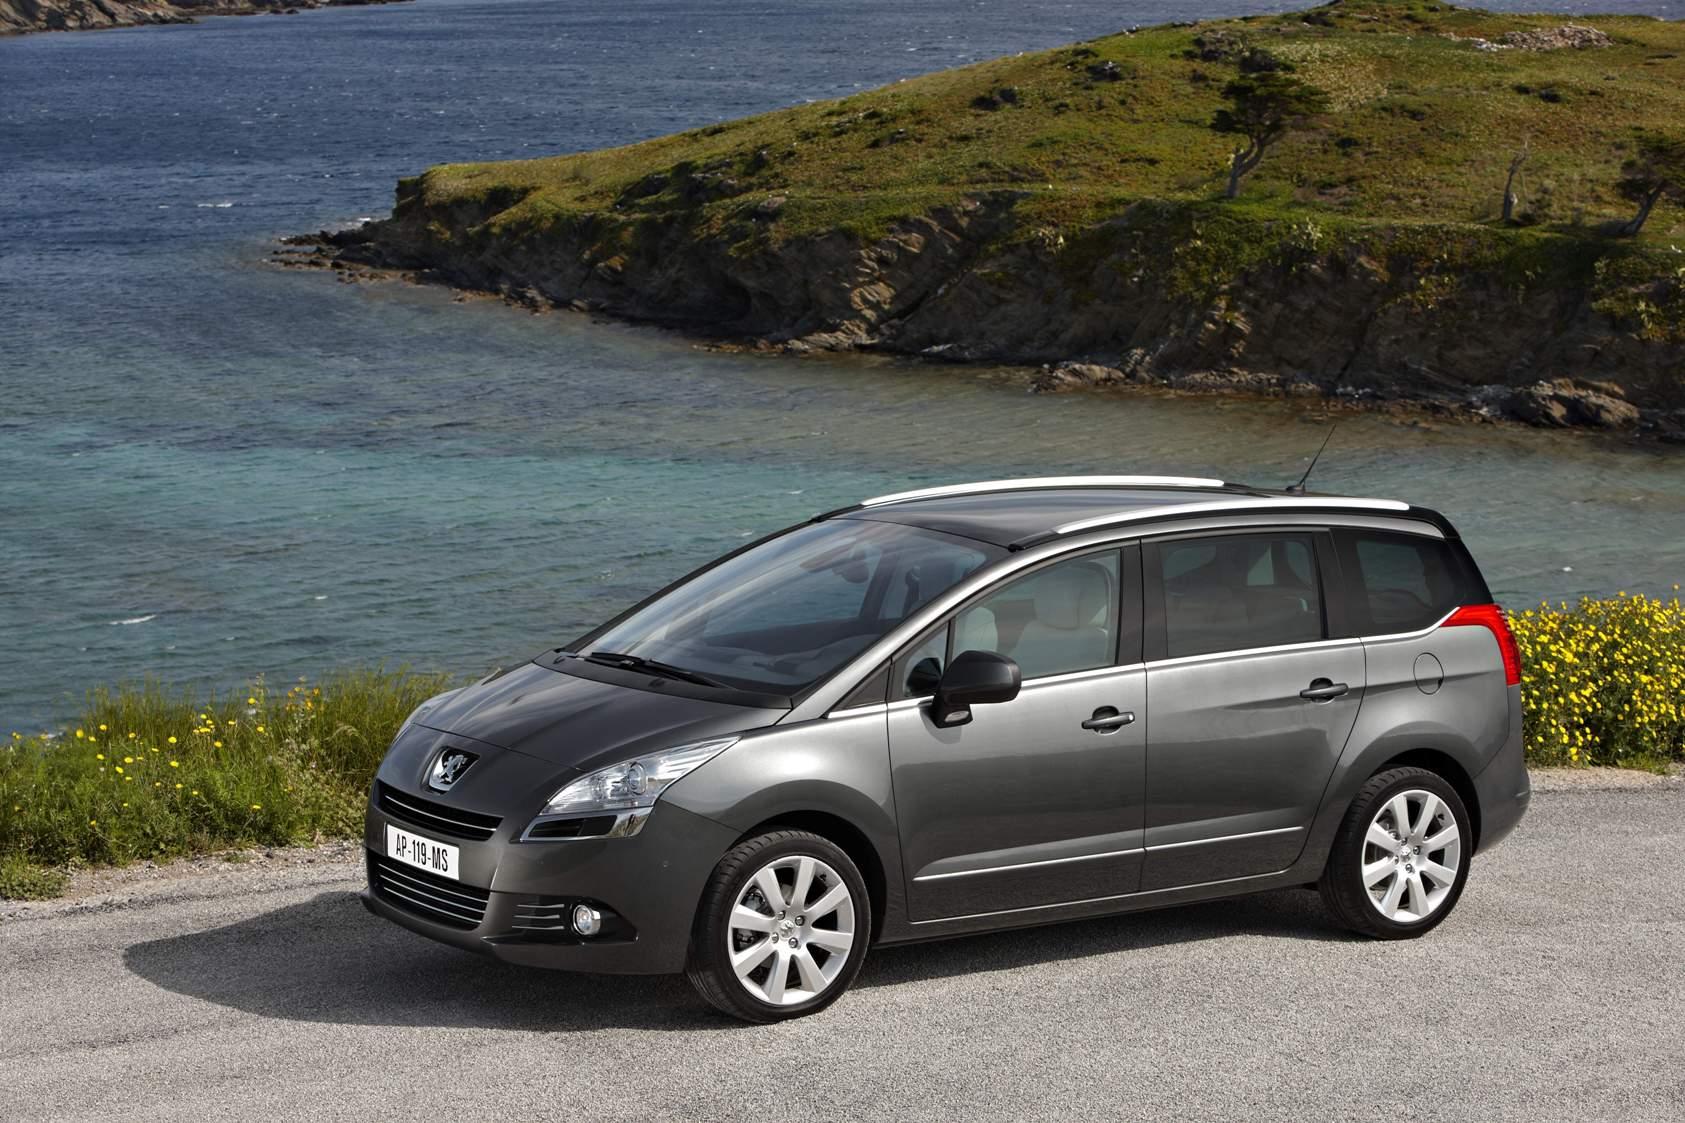 De Peugeot 5008 Wallpaper Car Free Download Image Of